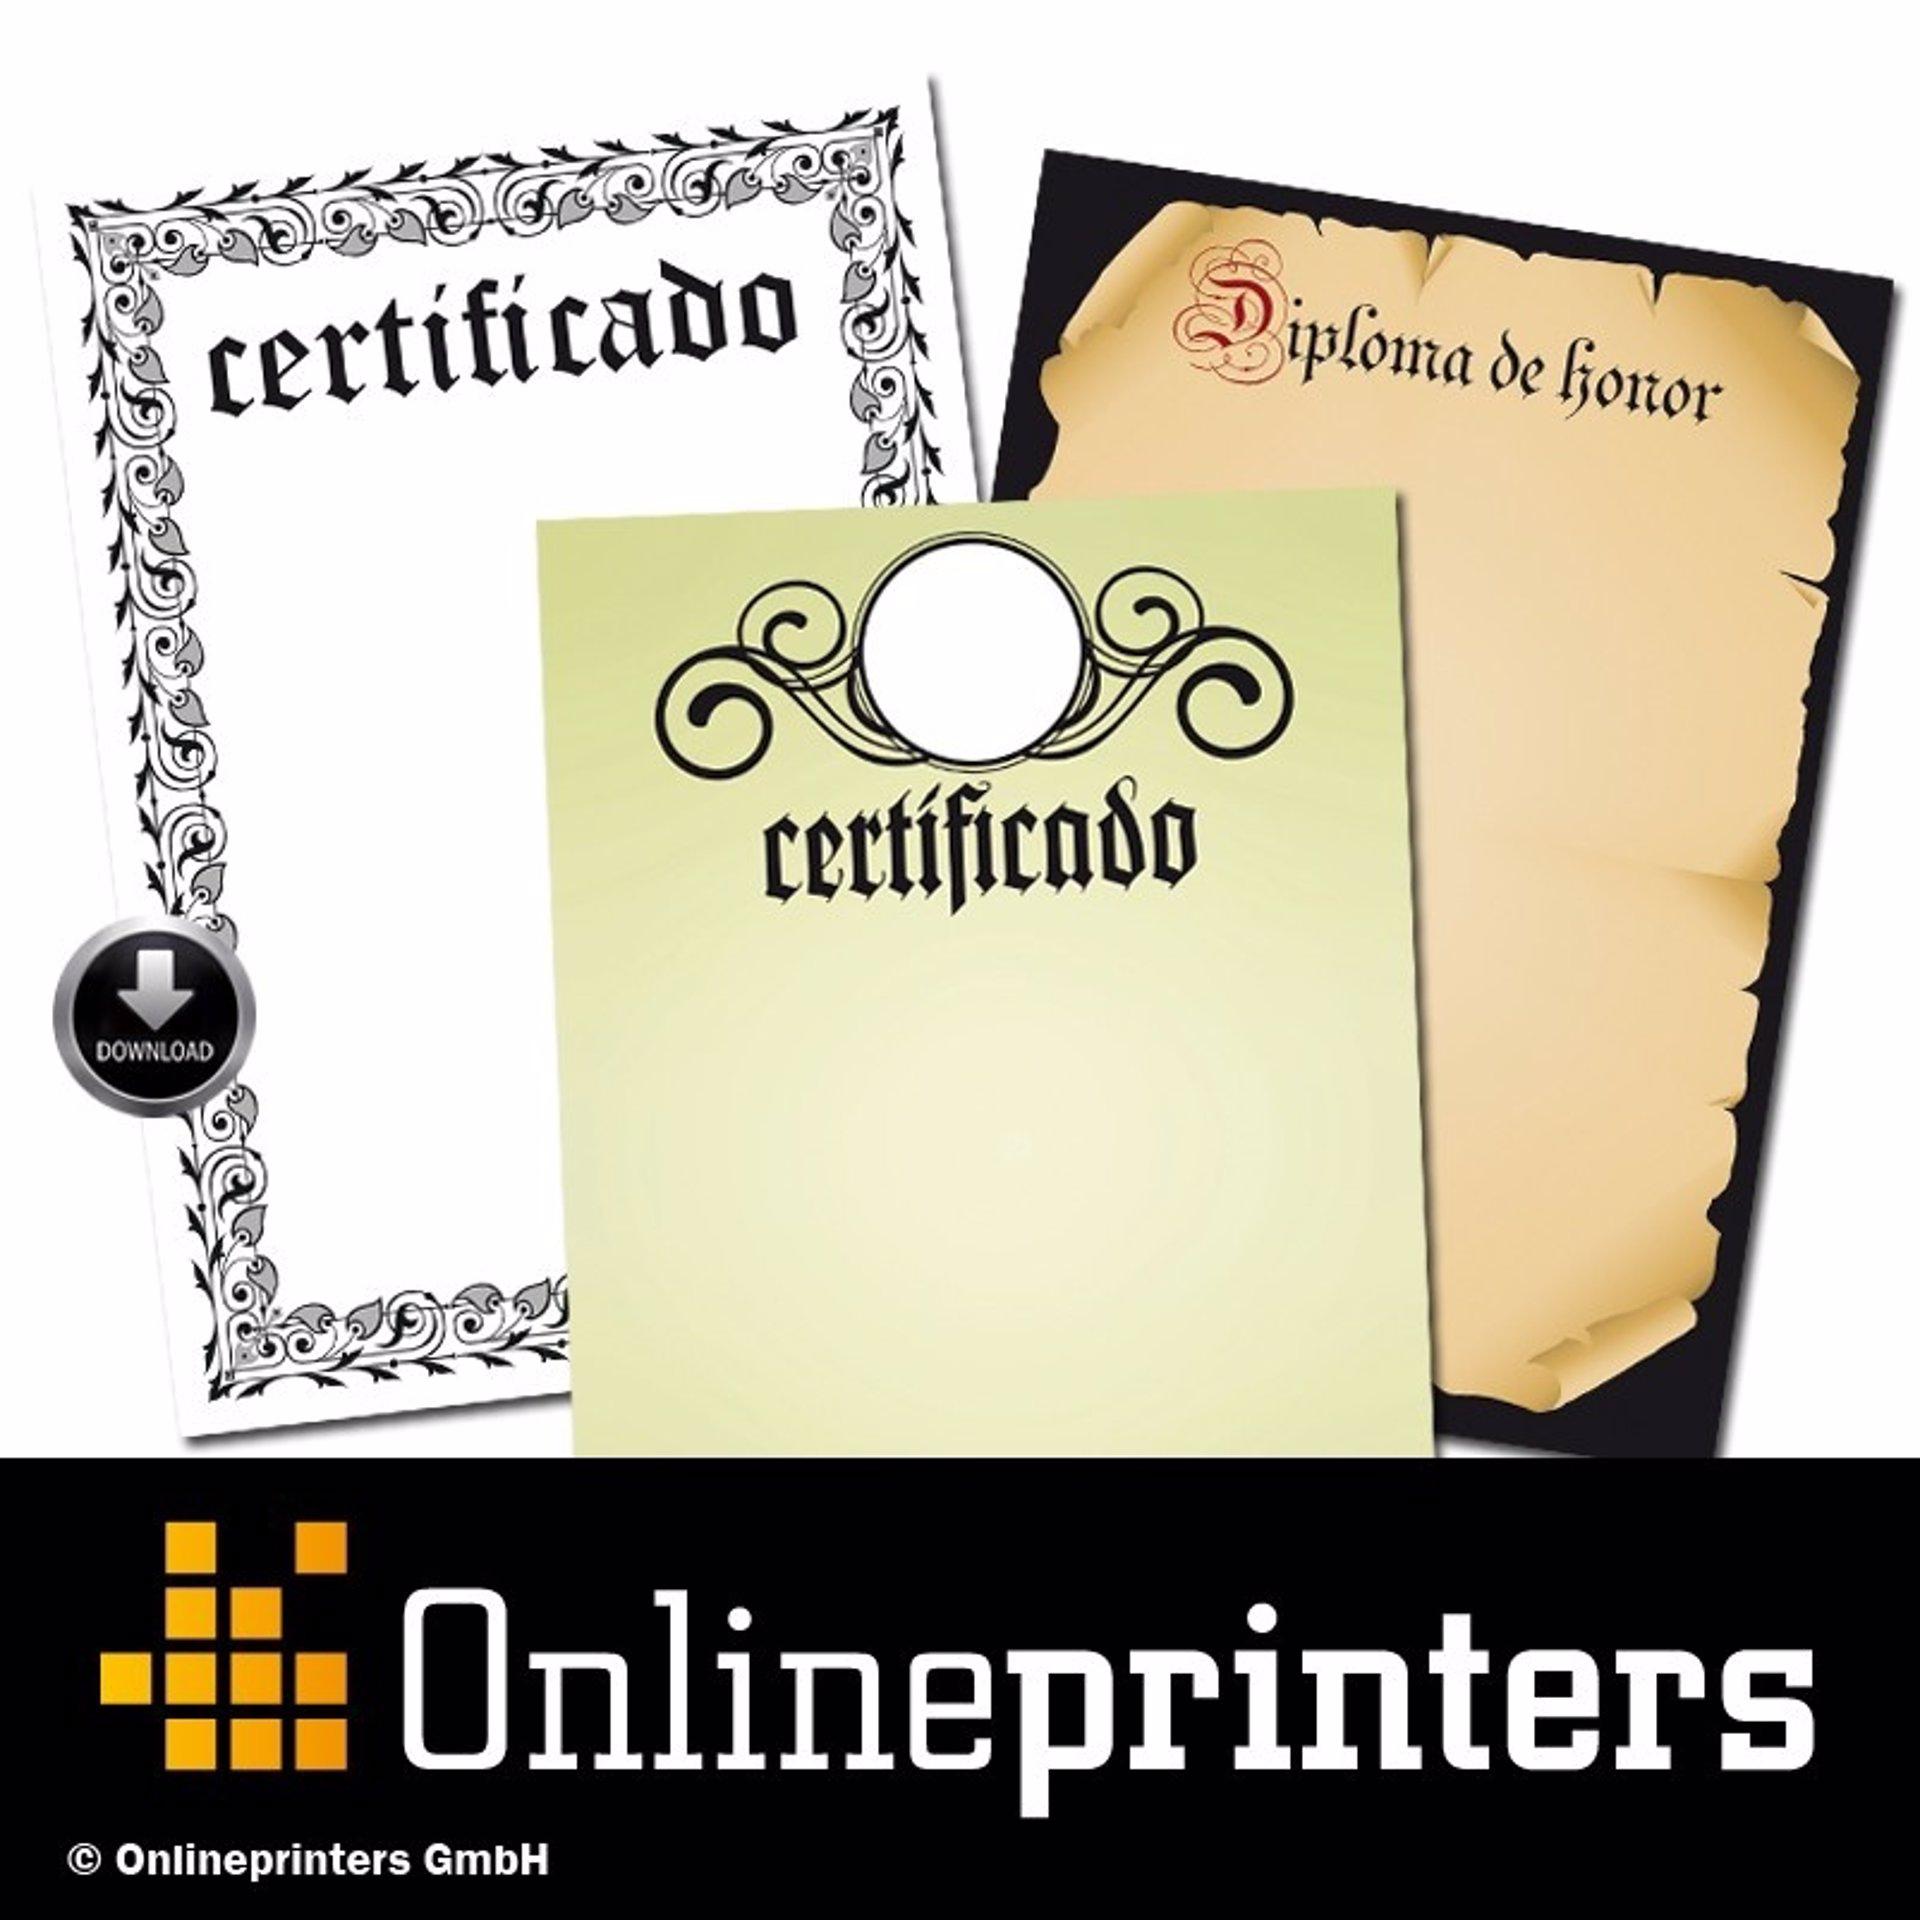 onlineprinters gmbh